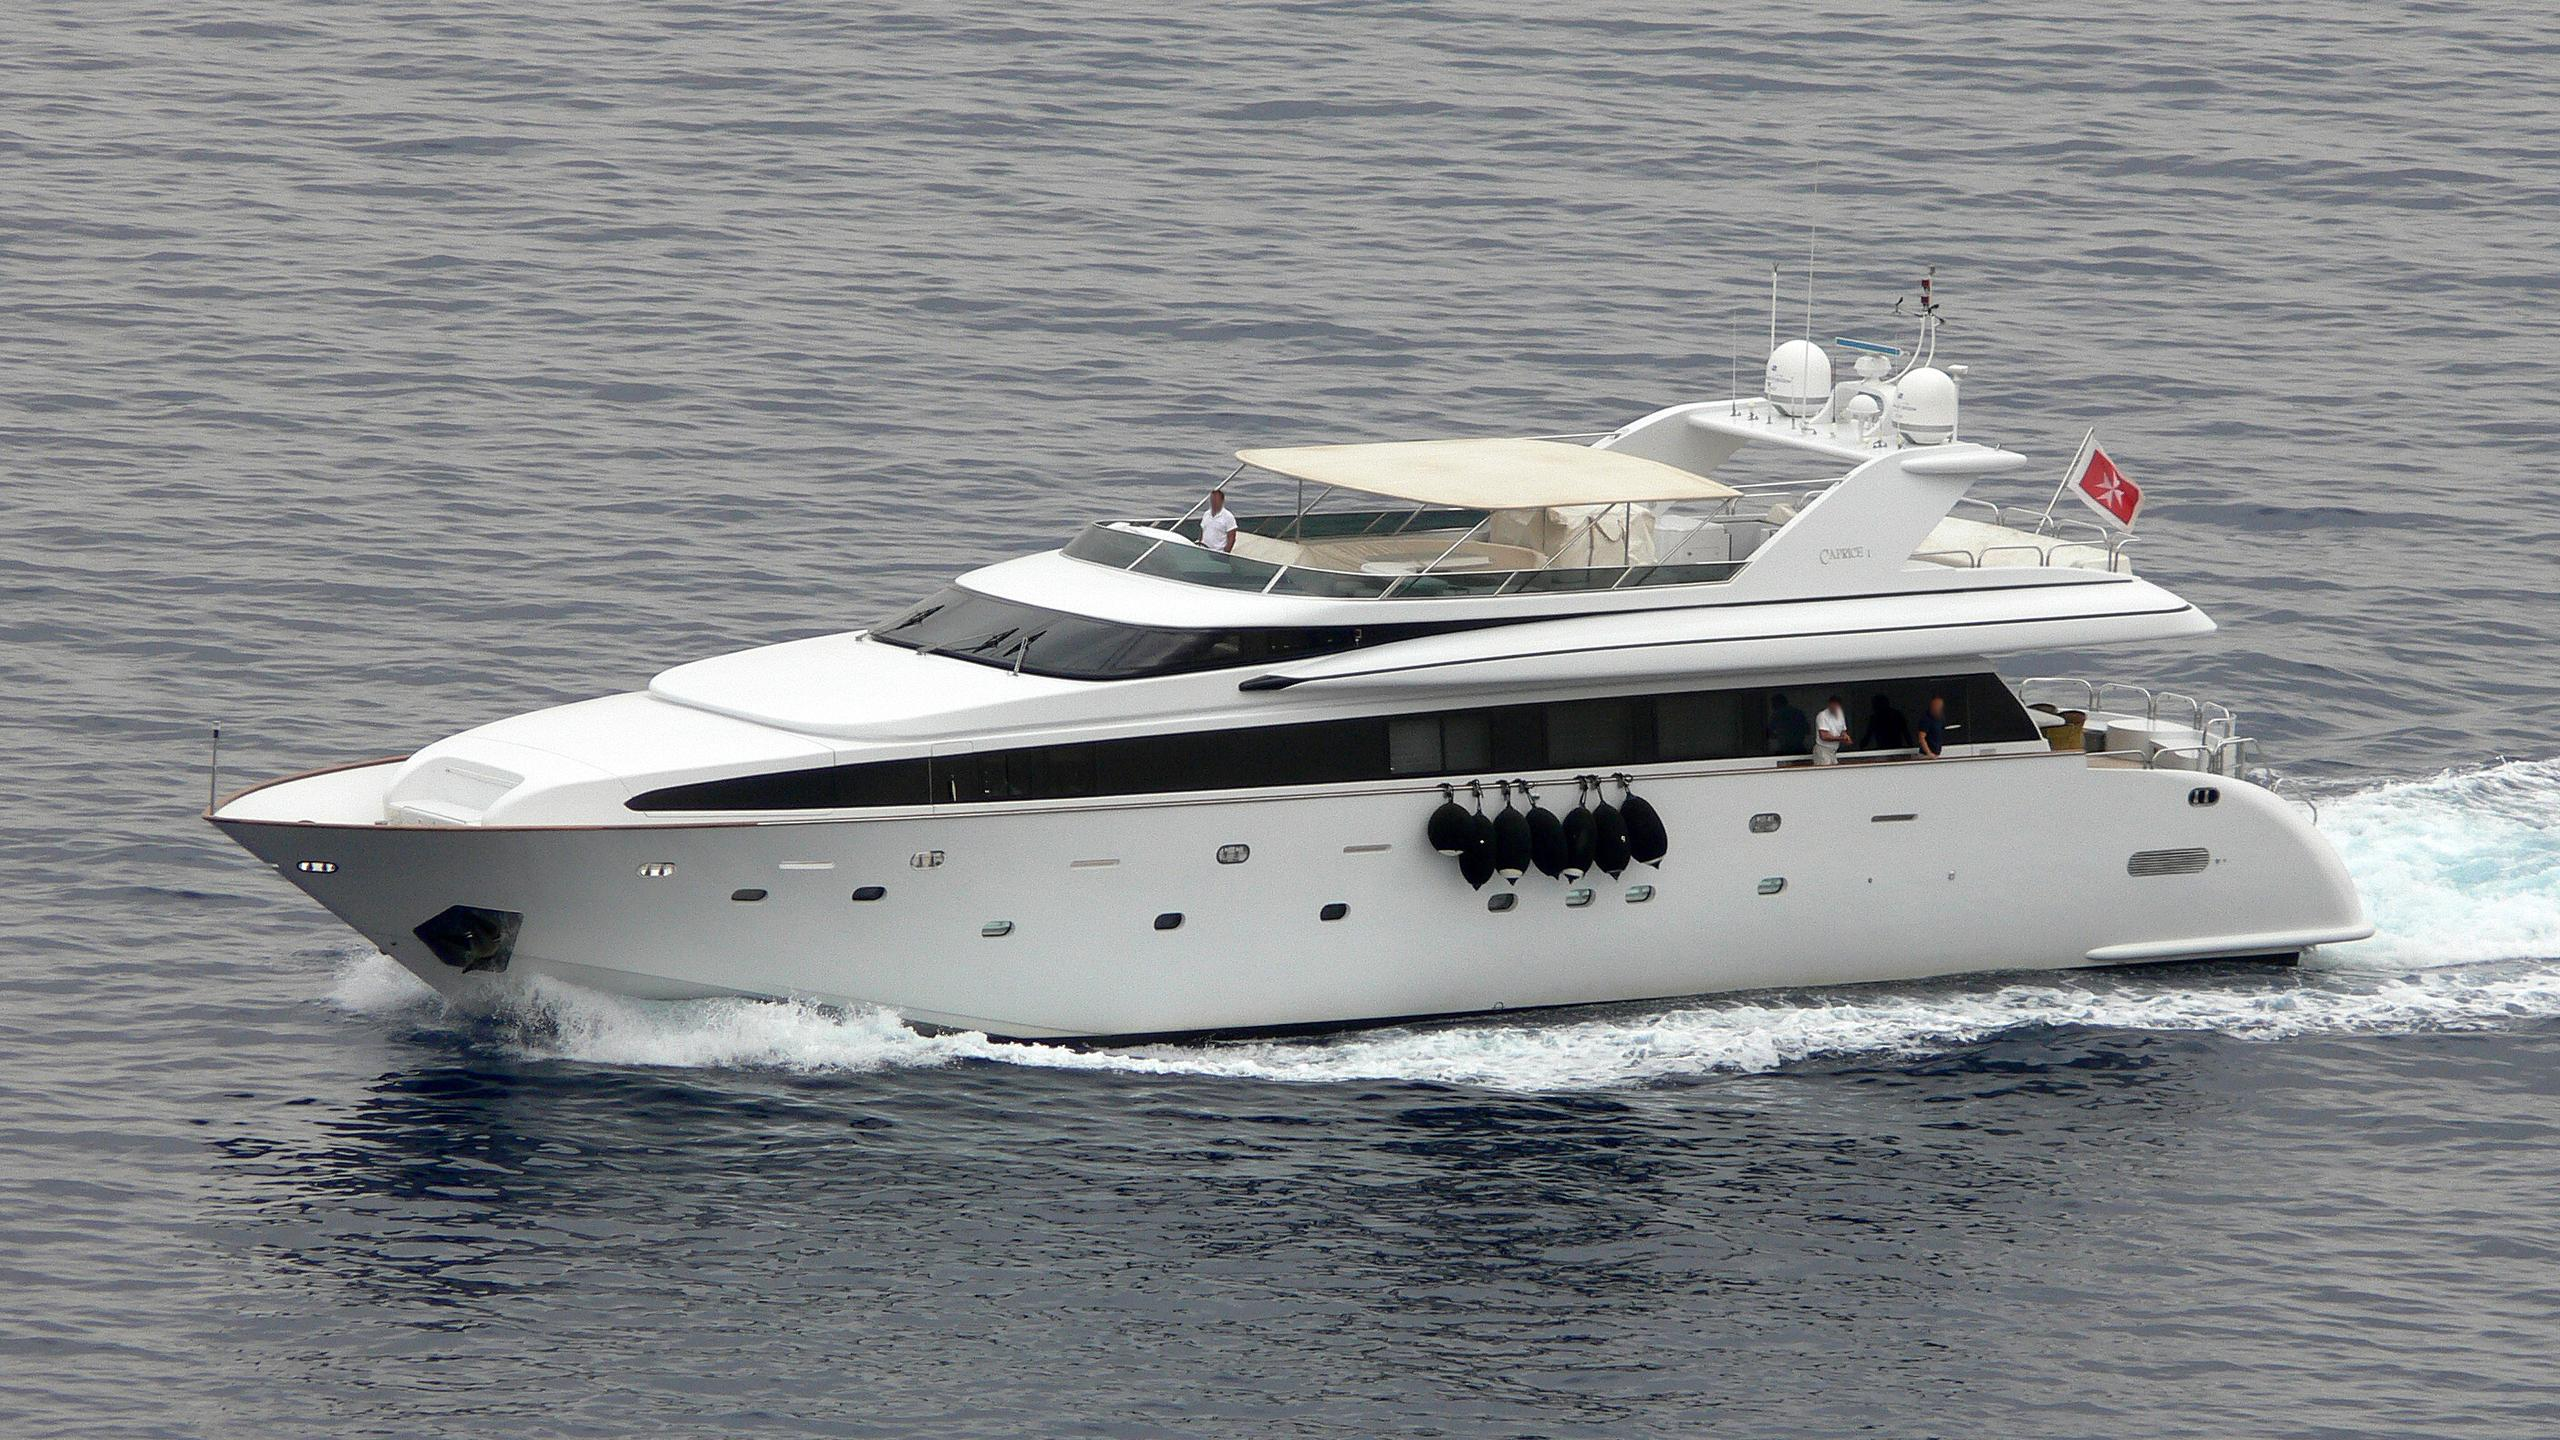 caprice-i-motor-yacht-barracuda-italmarine-1998-34m-cruising